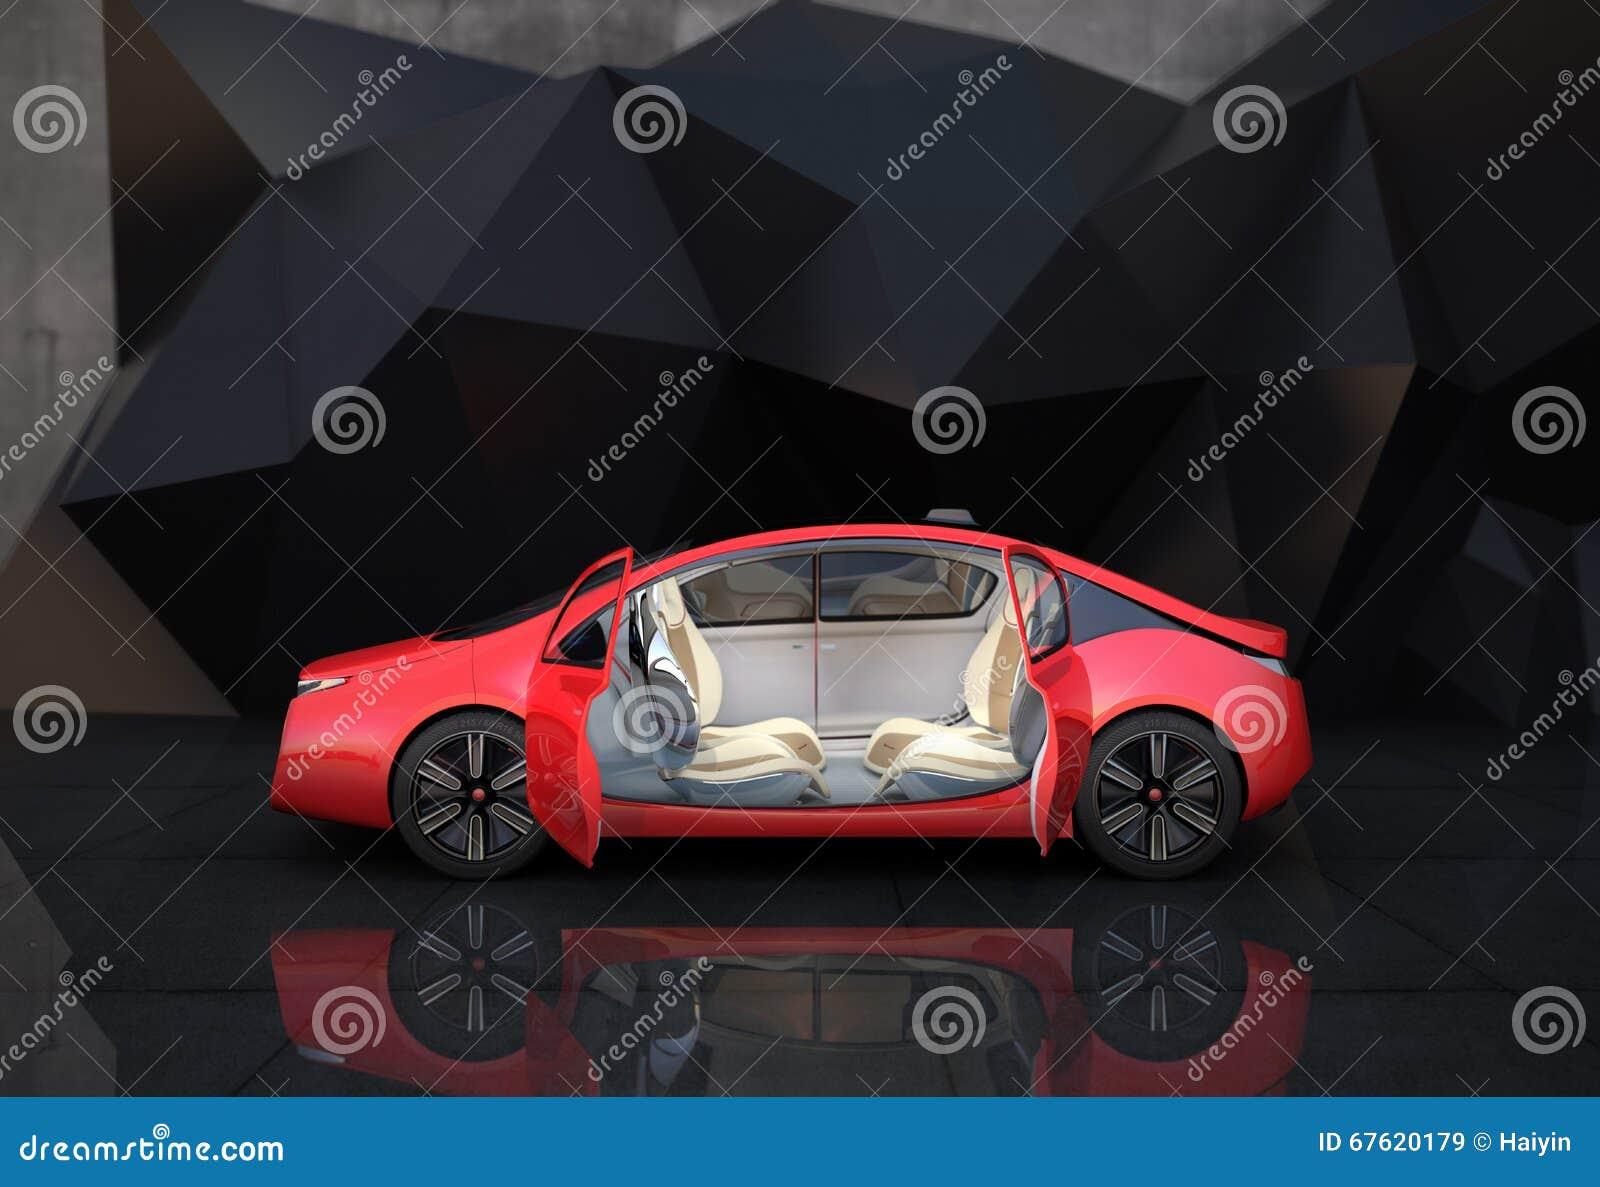 Vista lateral do carro autônomo vermelho na frente do fundo geométrico do objeto